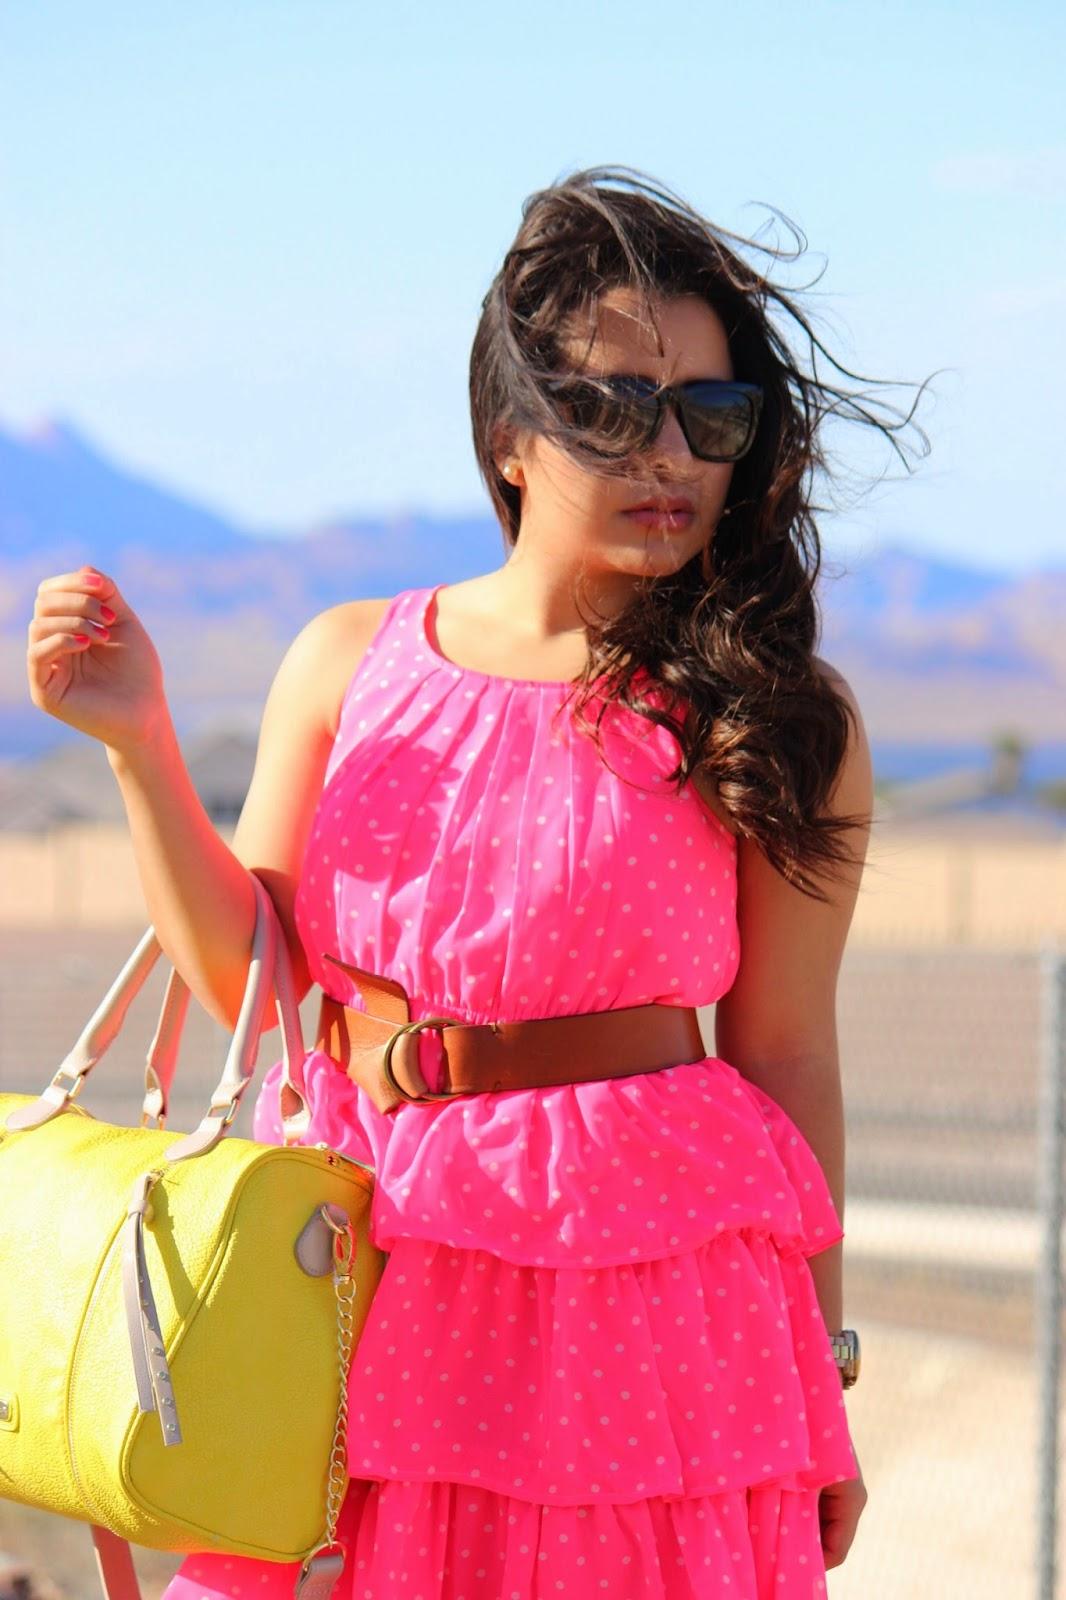 Neon ruffled dress, neon polka dot dress, neon satchel, steve madden neon handbag